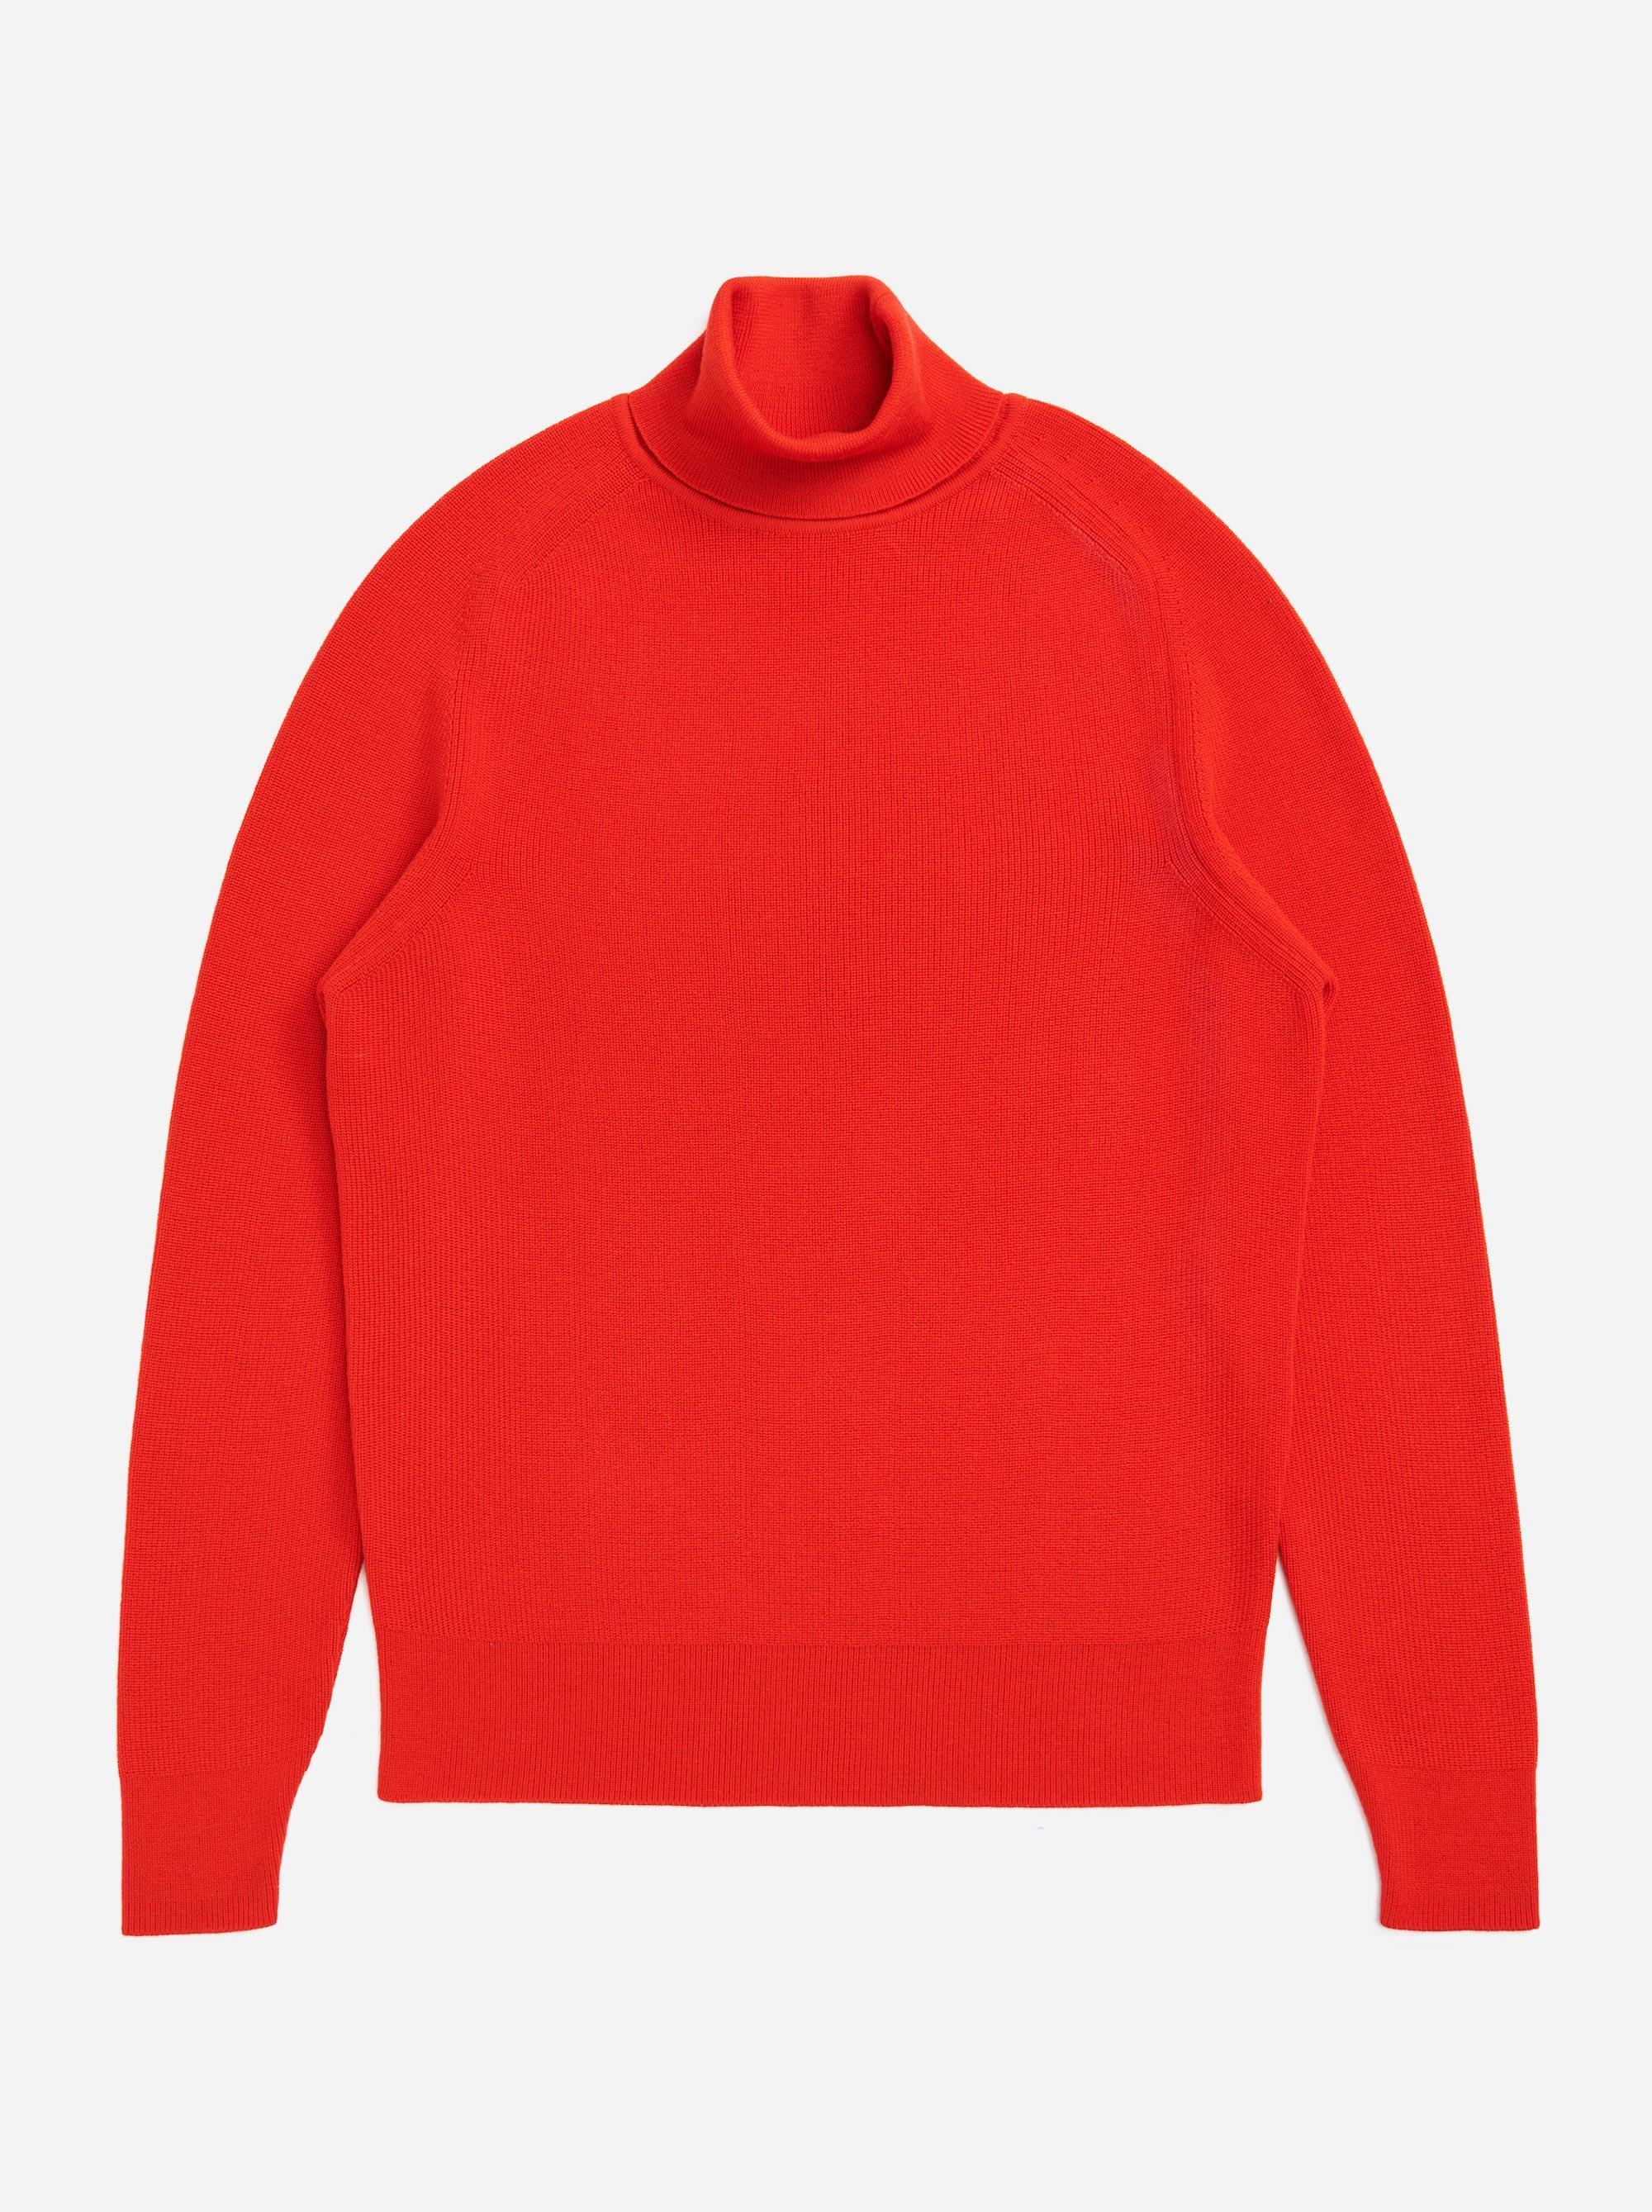 Teym - Turtleneck - The Merino Sweater - Men - Red - 4